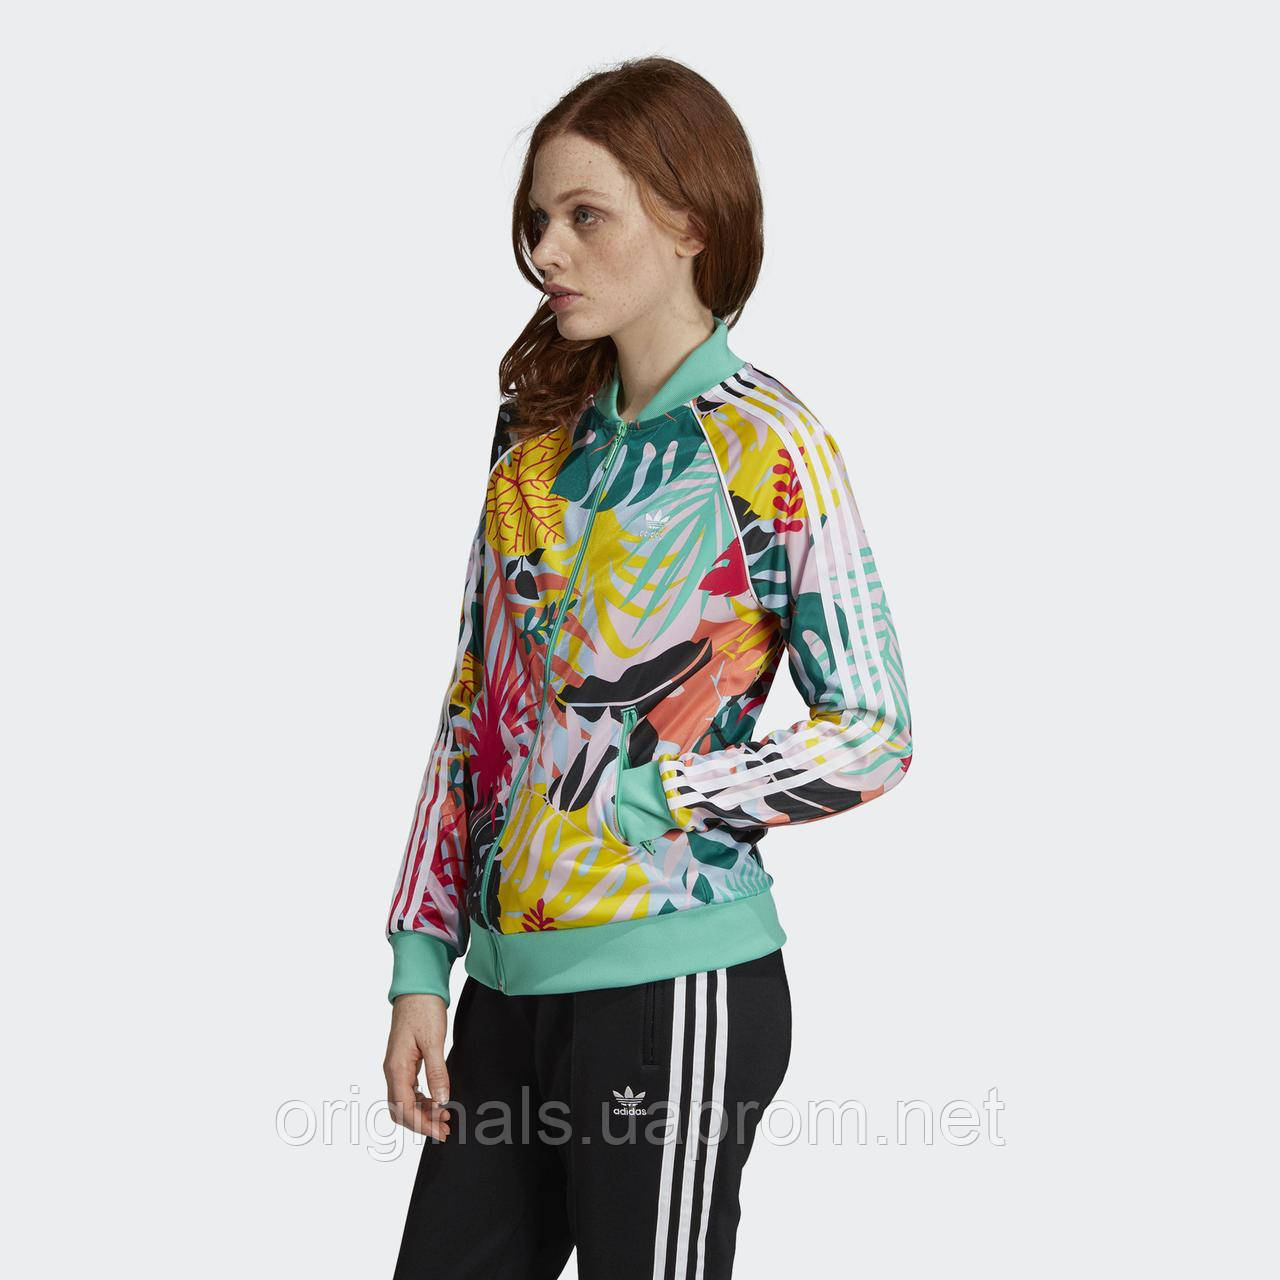 Женская олимпийка Adidas Tropicalage Superstar Graphic FH7991